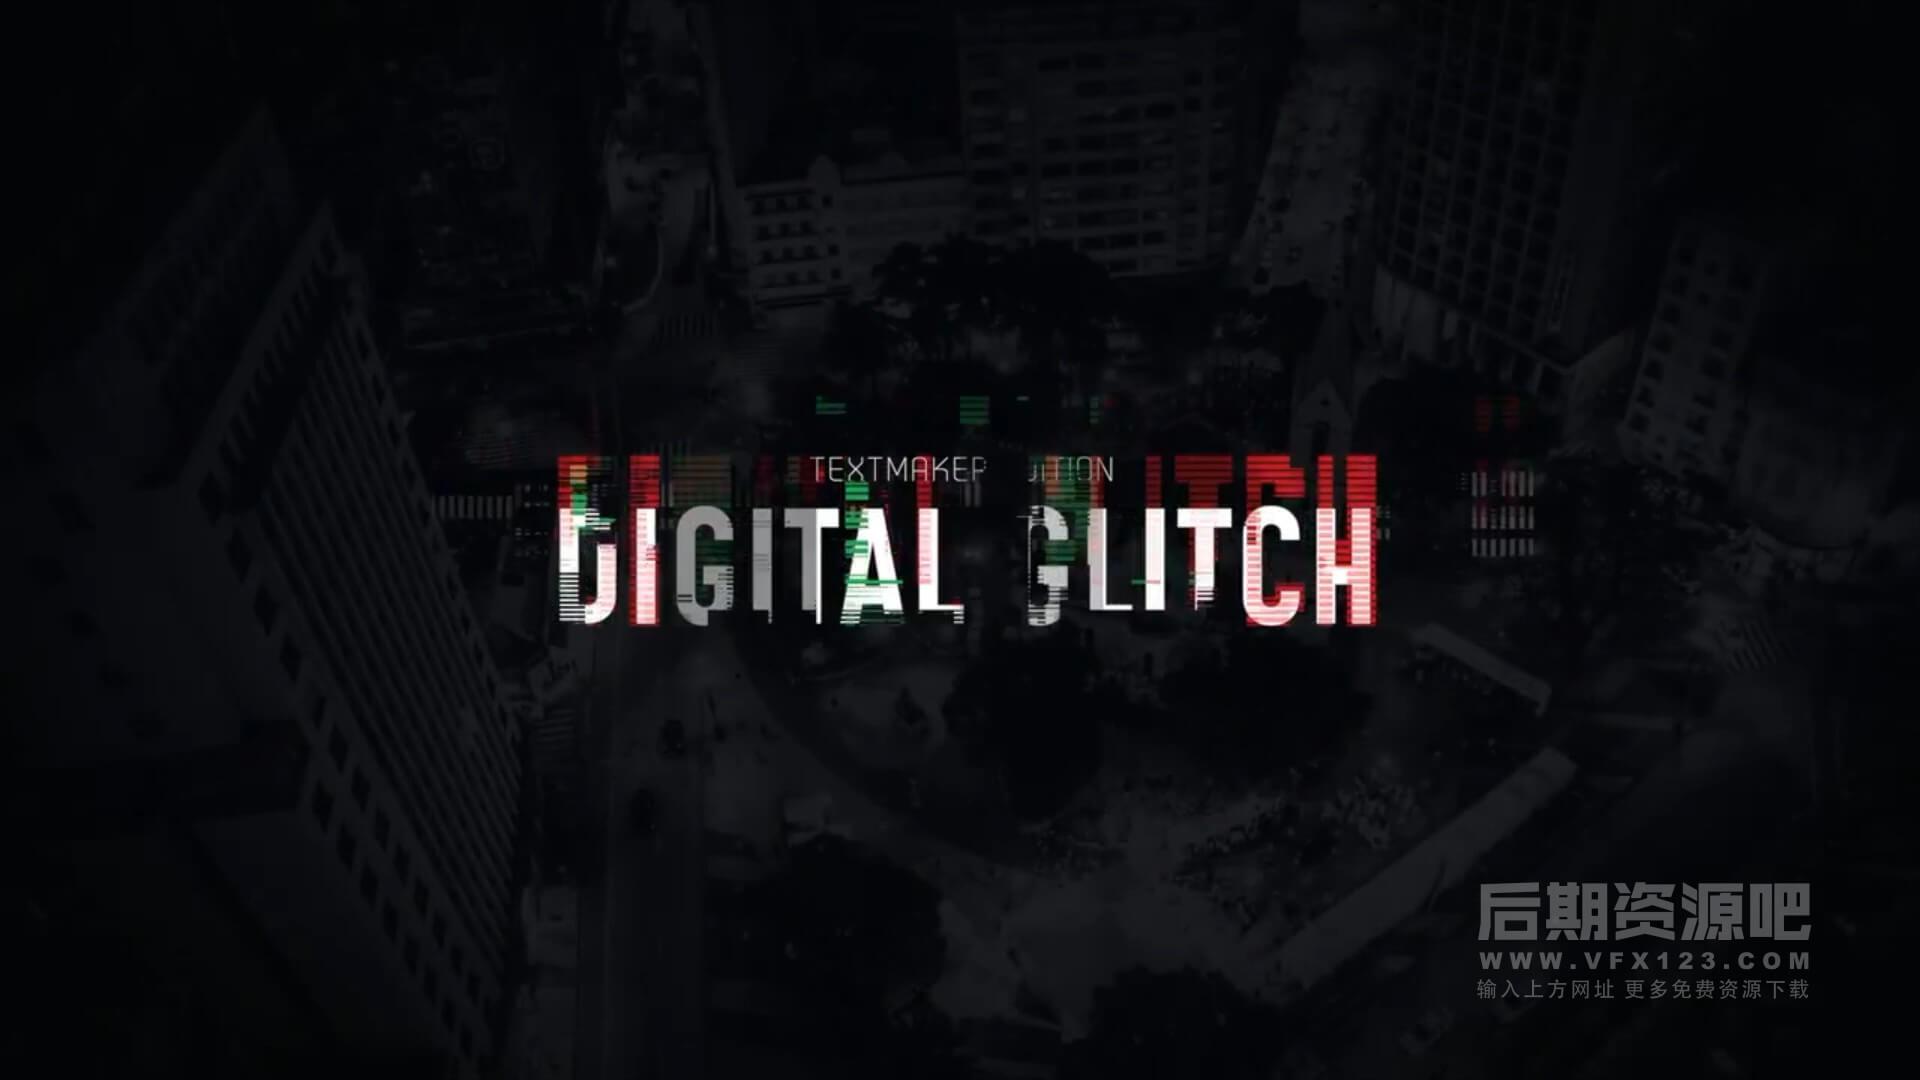 fcpx标题插件 数码评测科技类信号干扰特效标题模板 Titles Animator Digital Glitch